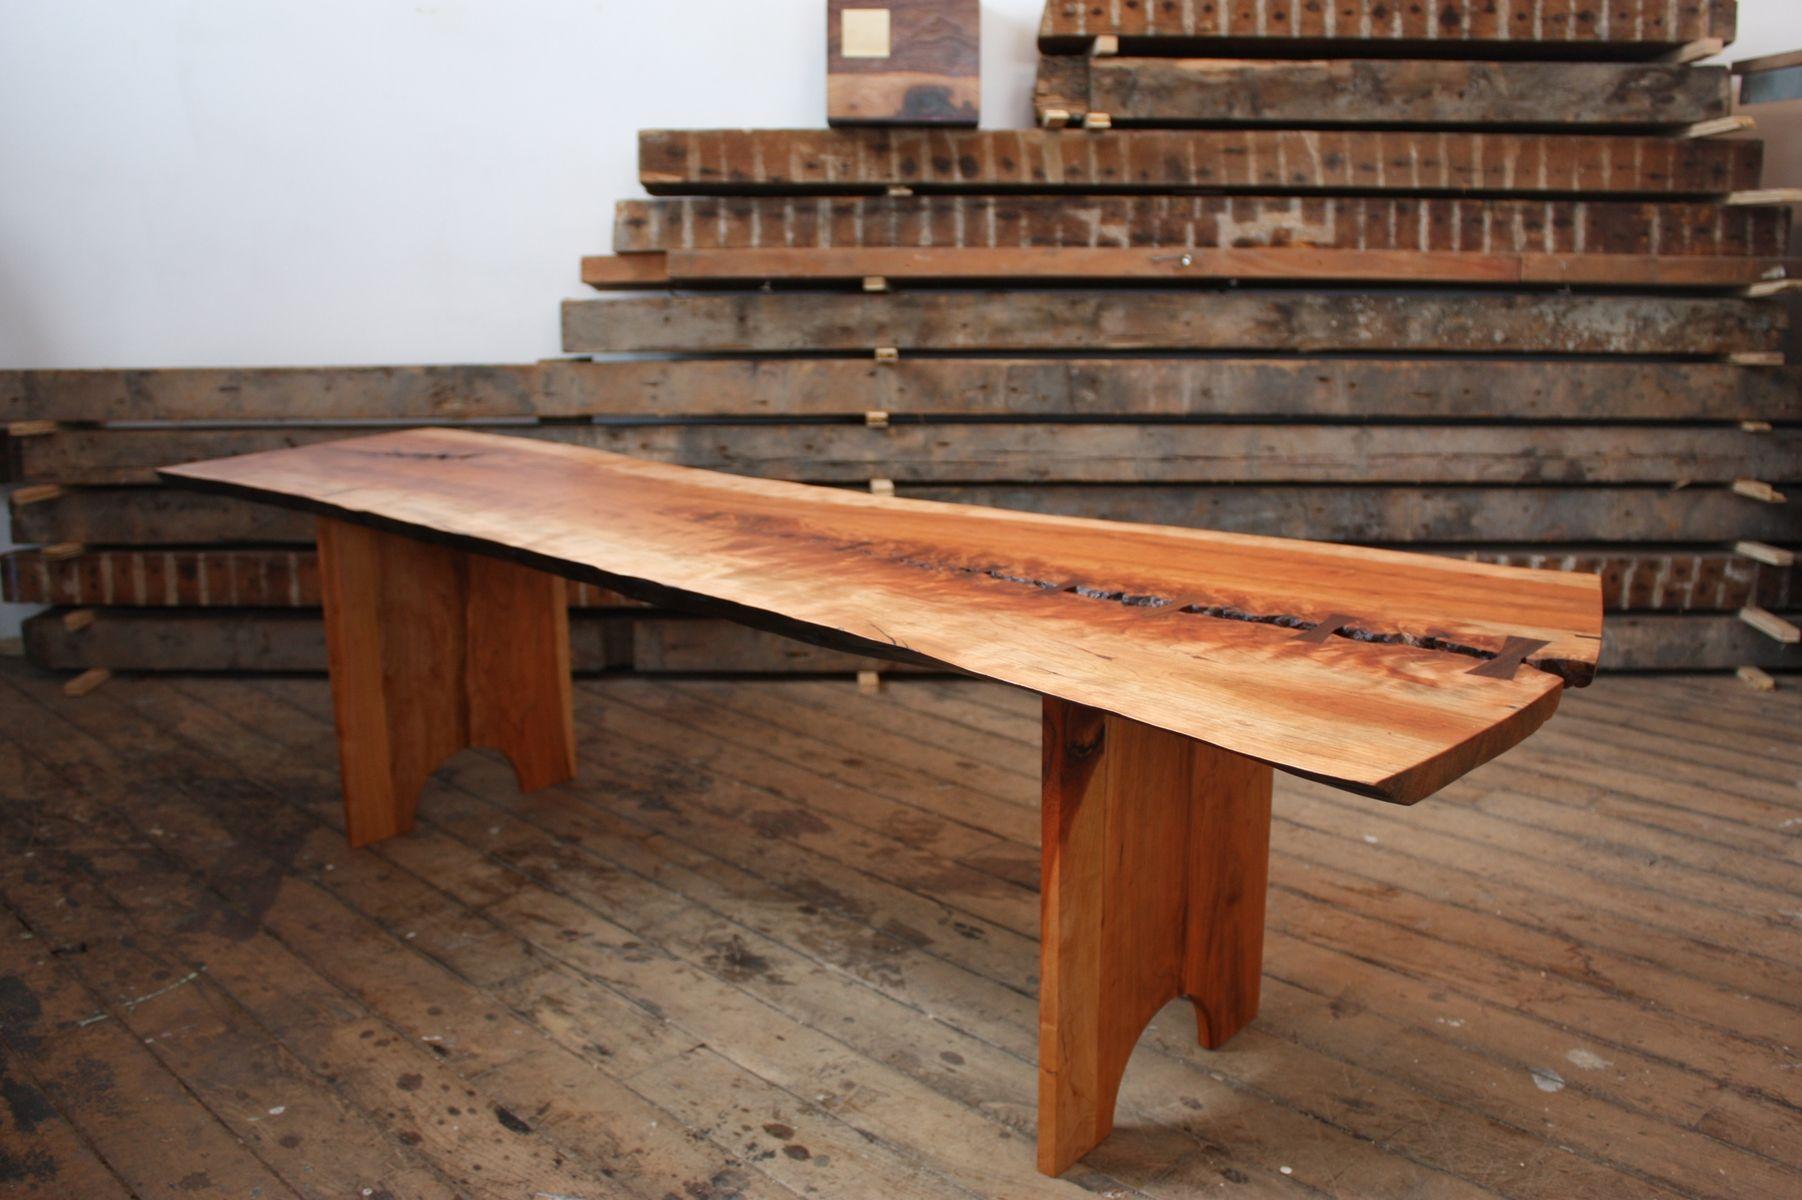 Cherry Slab Bench Wood Bench Design Bench Furniture Live Edge Furniture